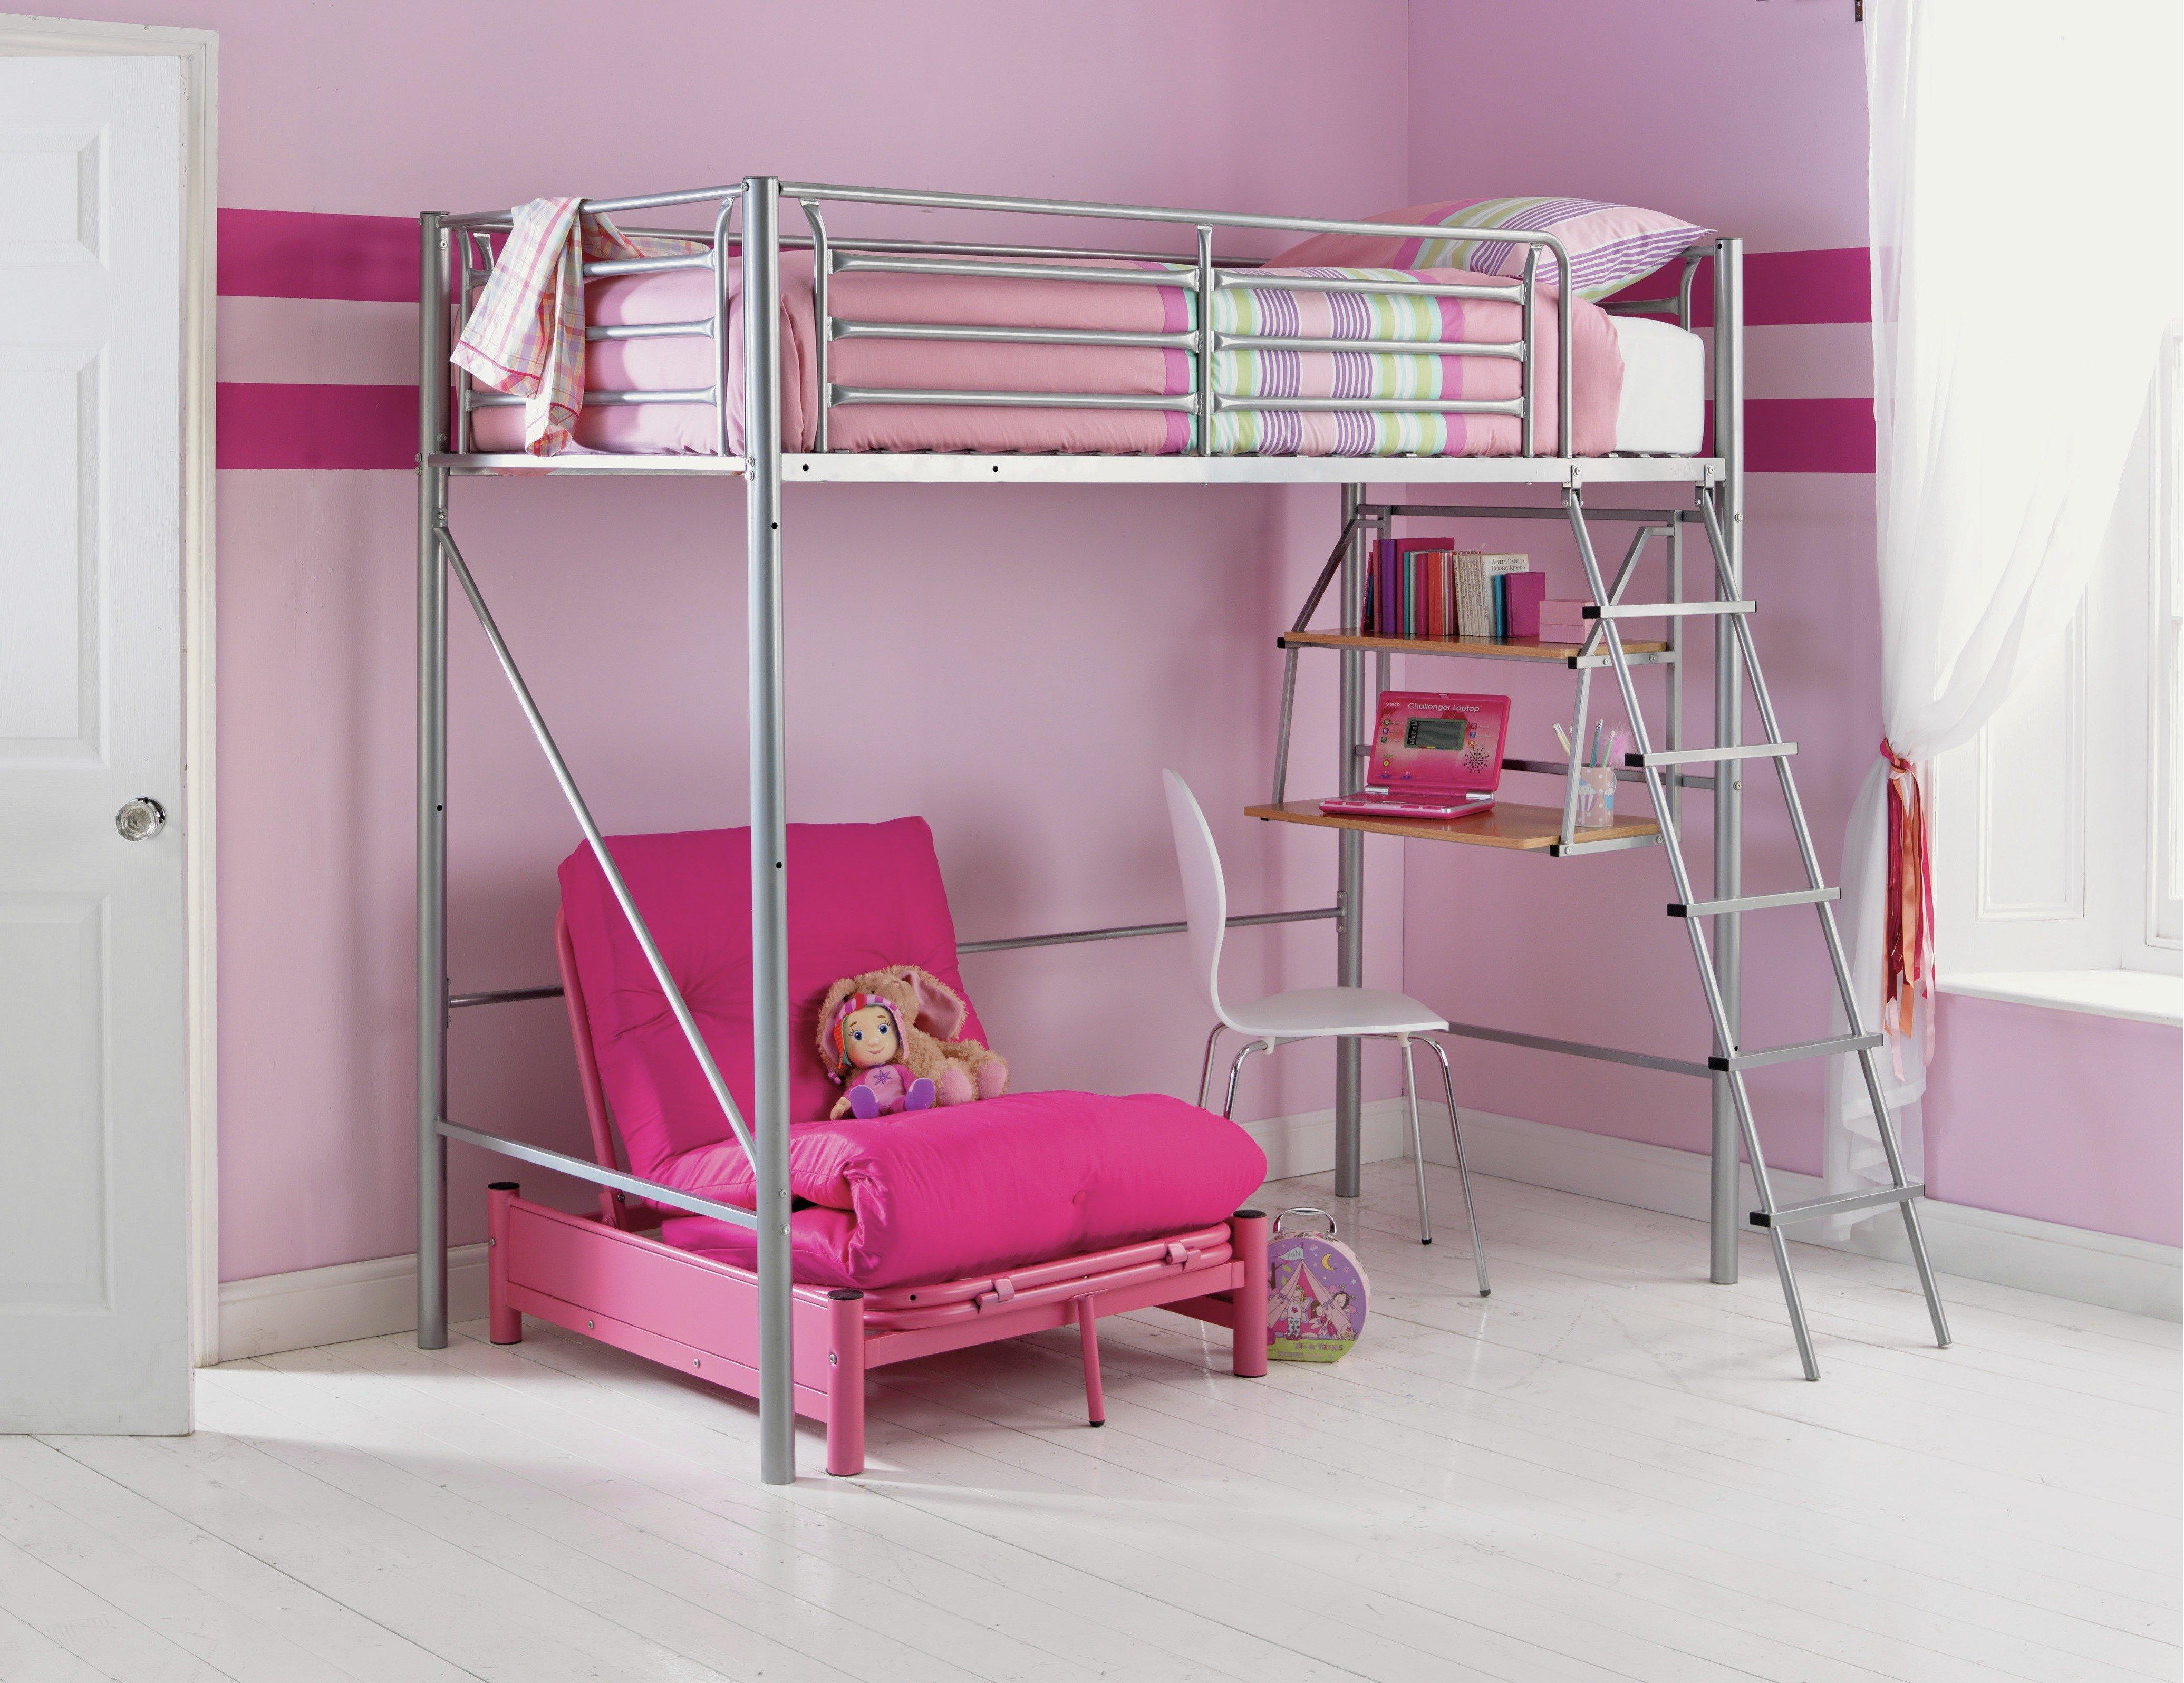 High sleeper loft style cabin bed with hideaway futon bed rutland - Home Sit U0027n Sleep Metal High Sleeper Bed Frame Pink Futon737 2140